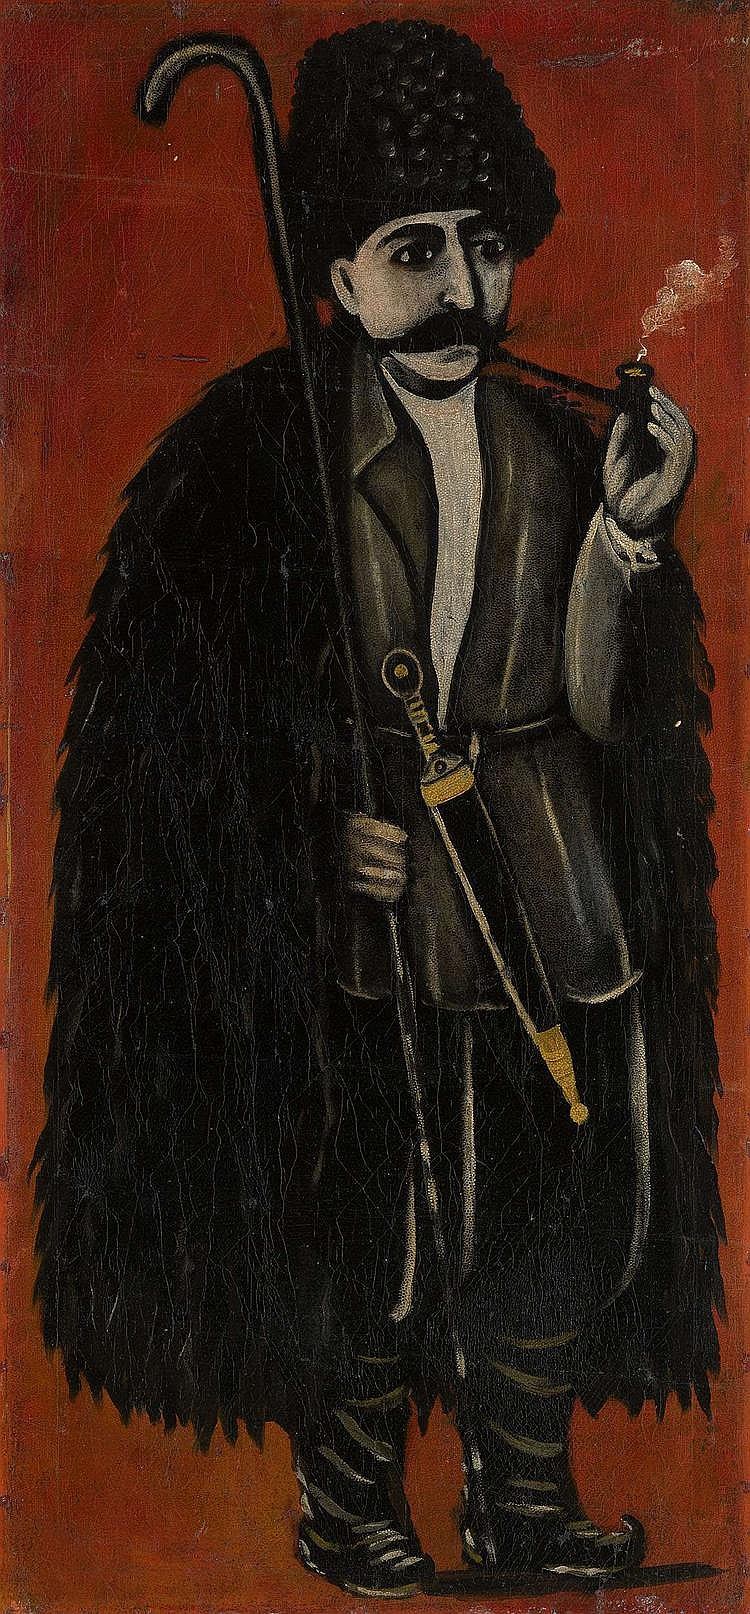 PIROSMANI, NIKO (1863-1918) Shepherd in a Felt Cloak against a Red Background.